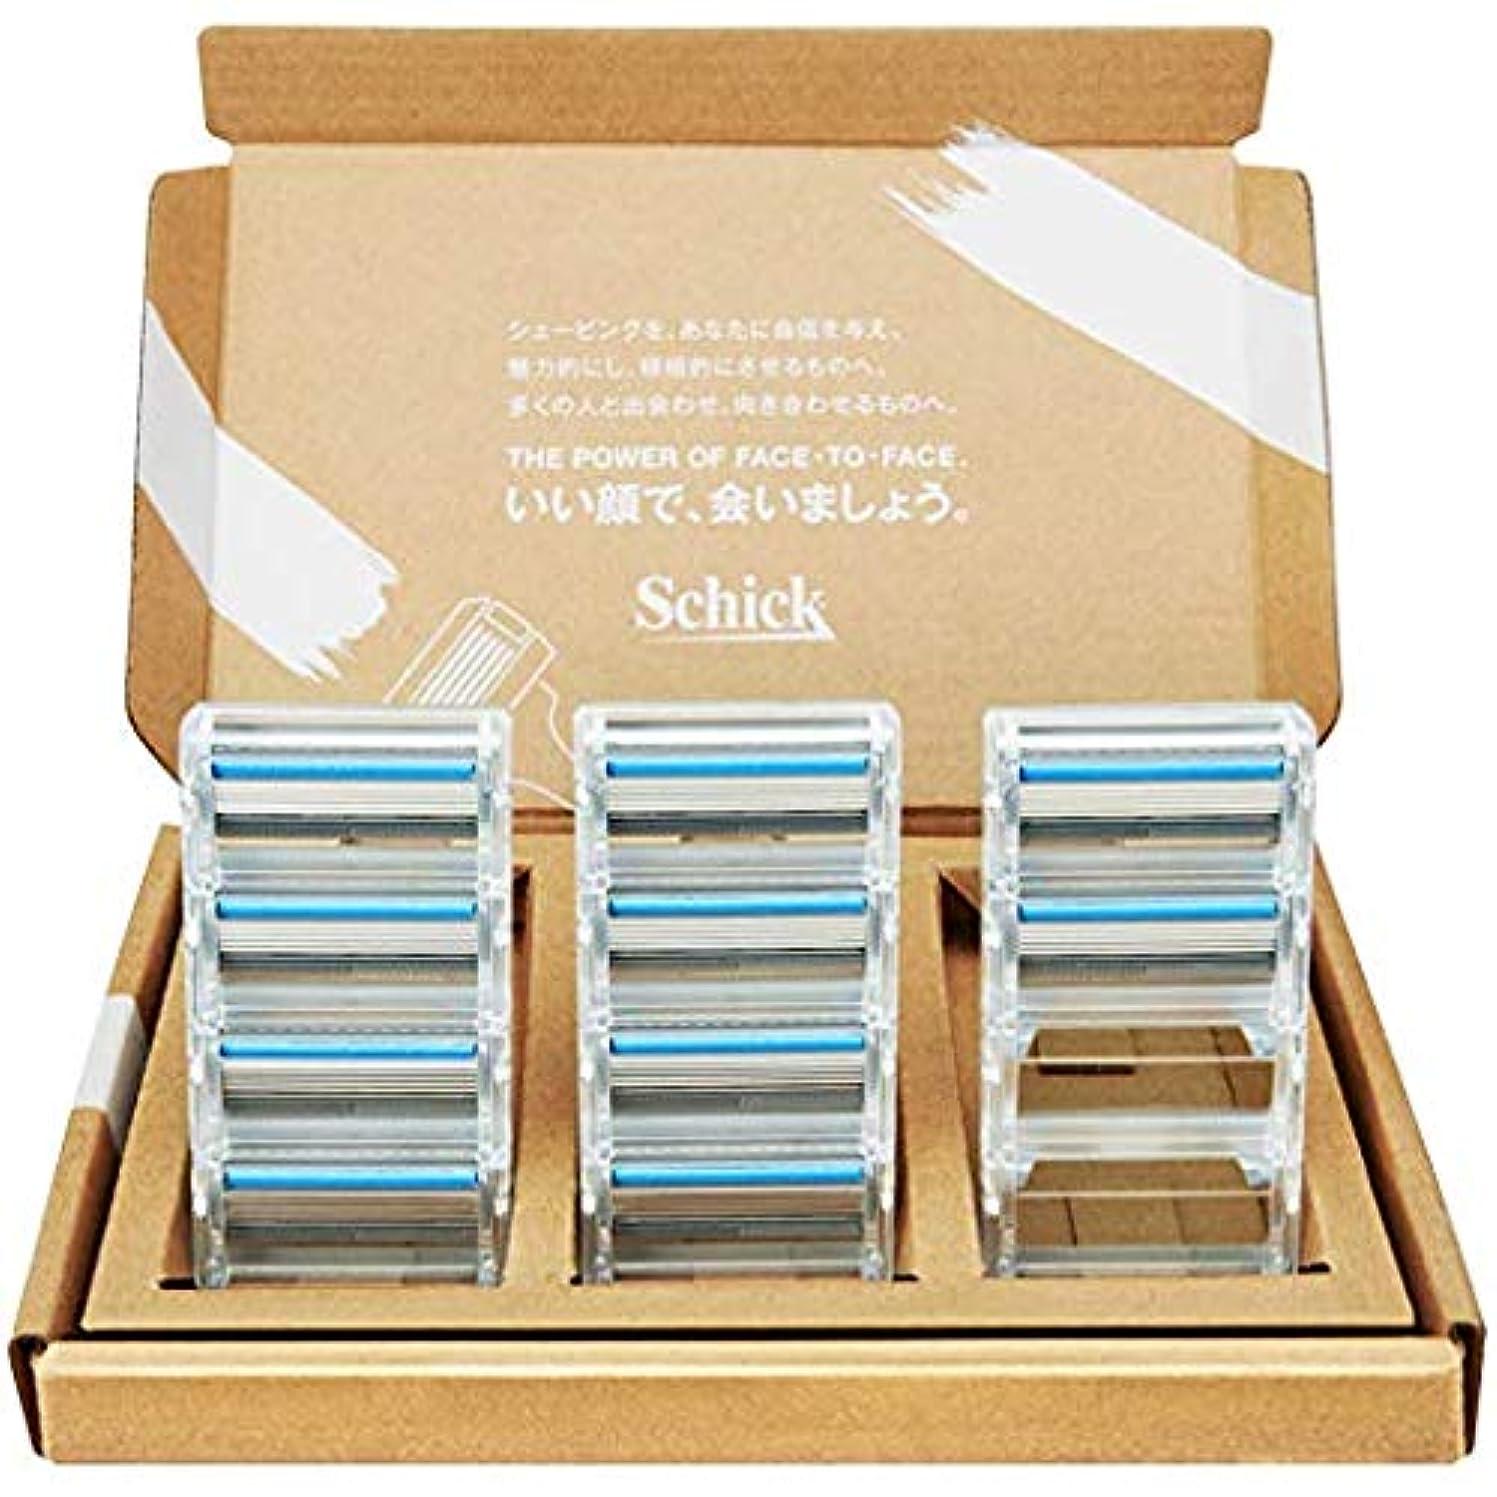 【Amazon.co.jp 限定】シック クアトロ5 チタニウム 替刃 10コ入